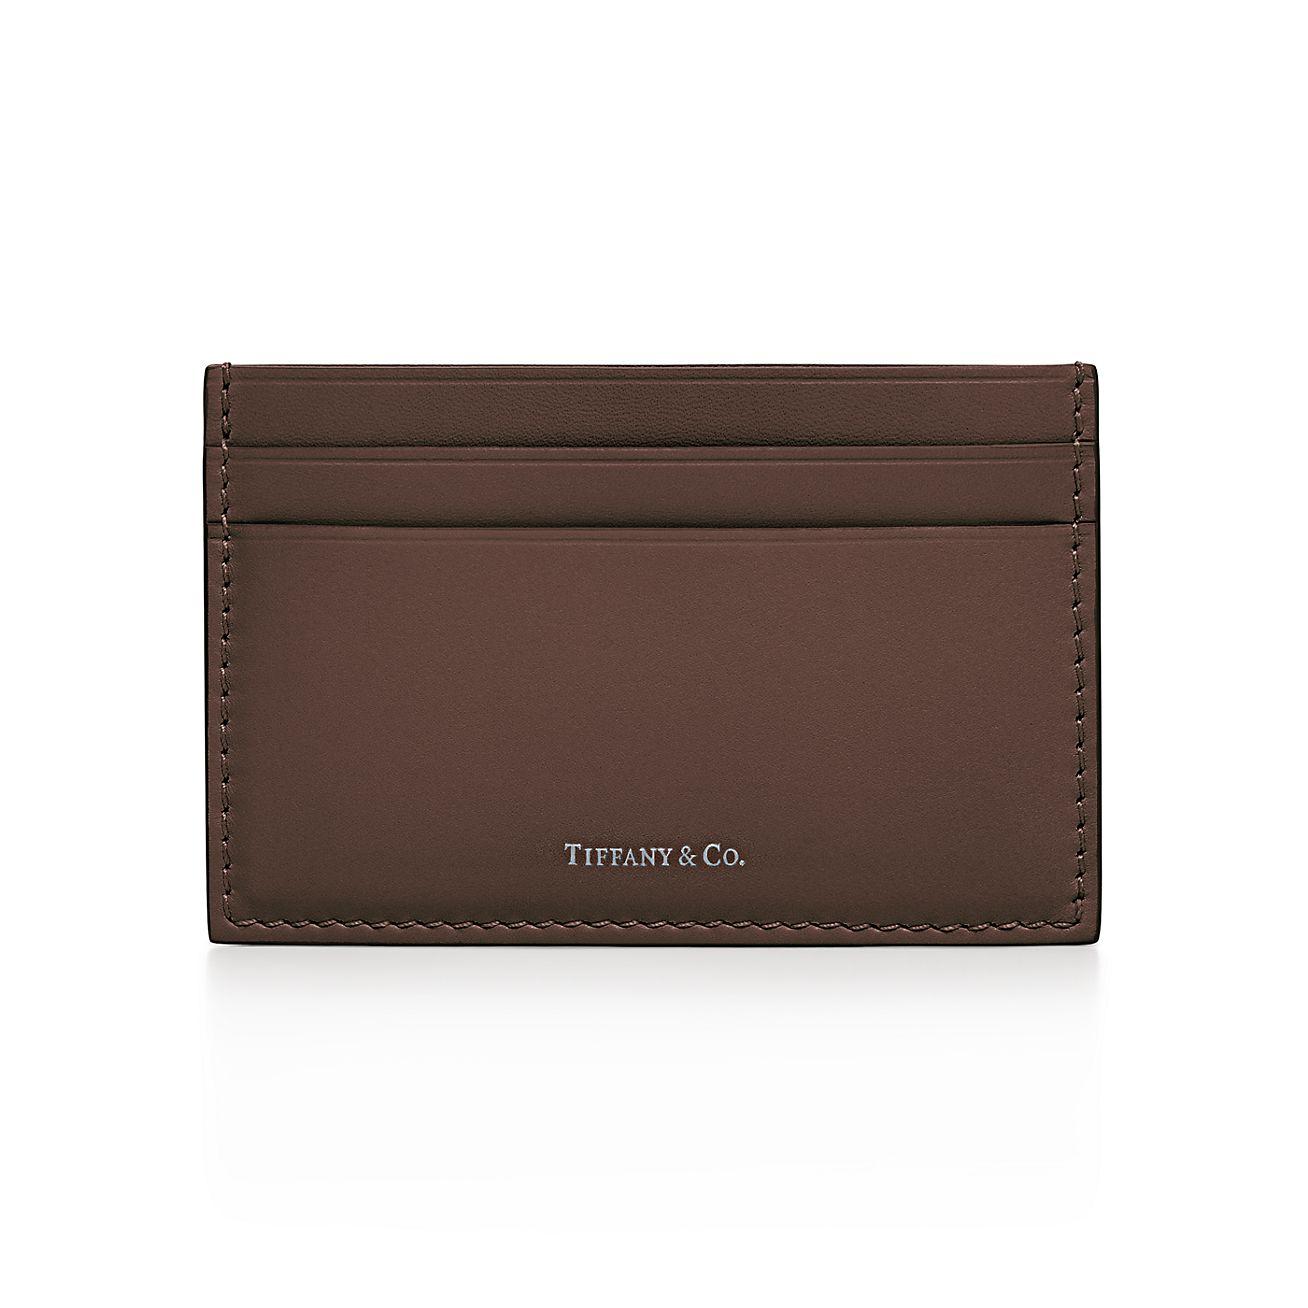 Card case in Tiffany Blue smooth calfskin leather Tiffany & Co. QKYY4